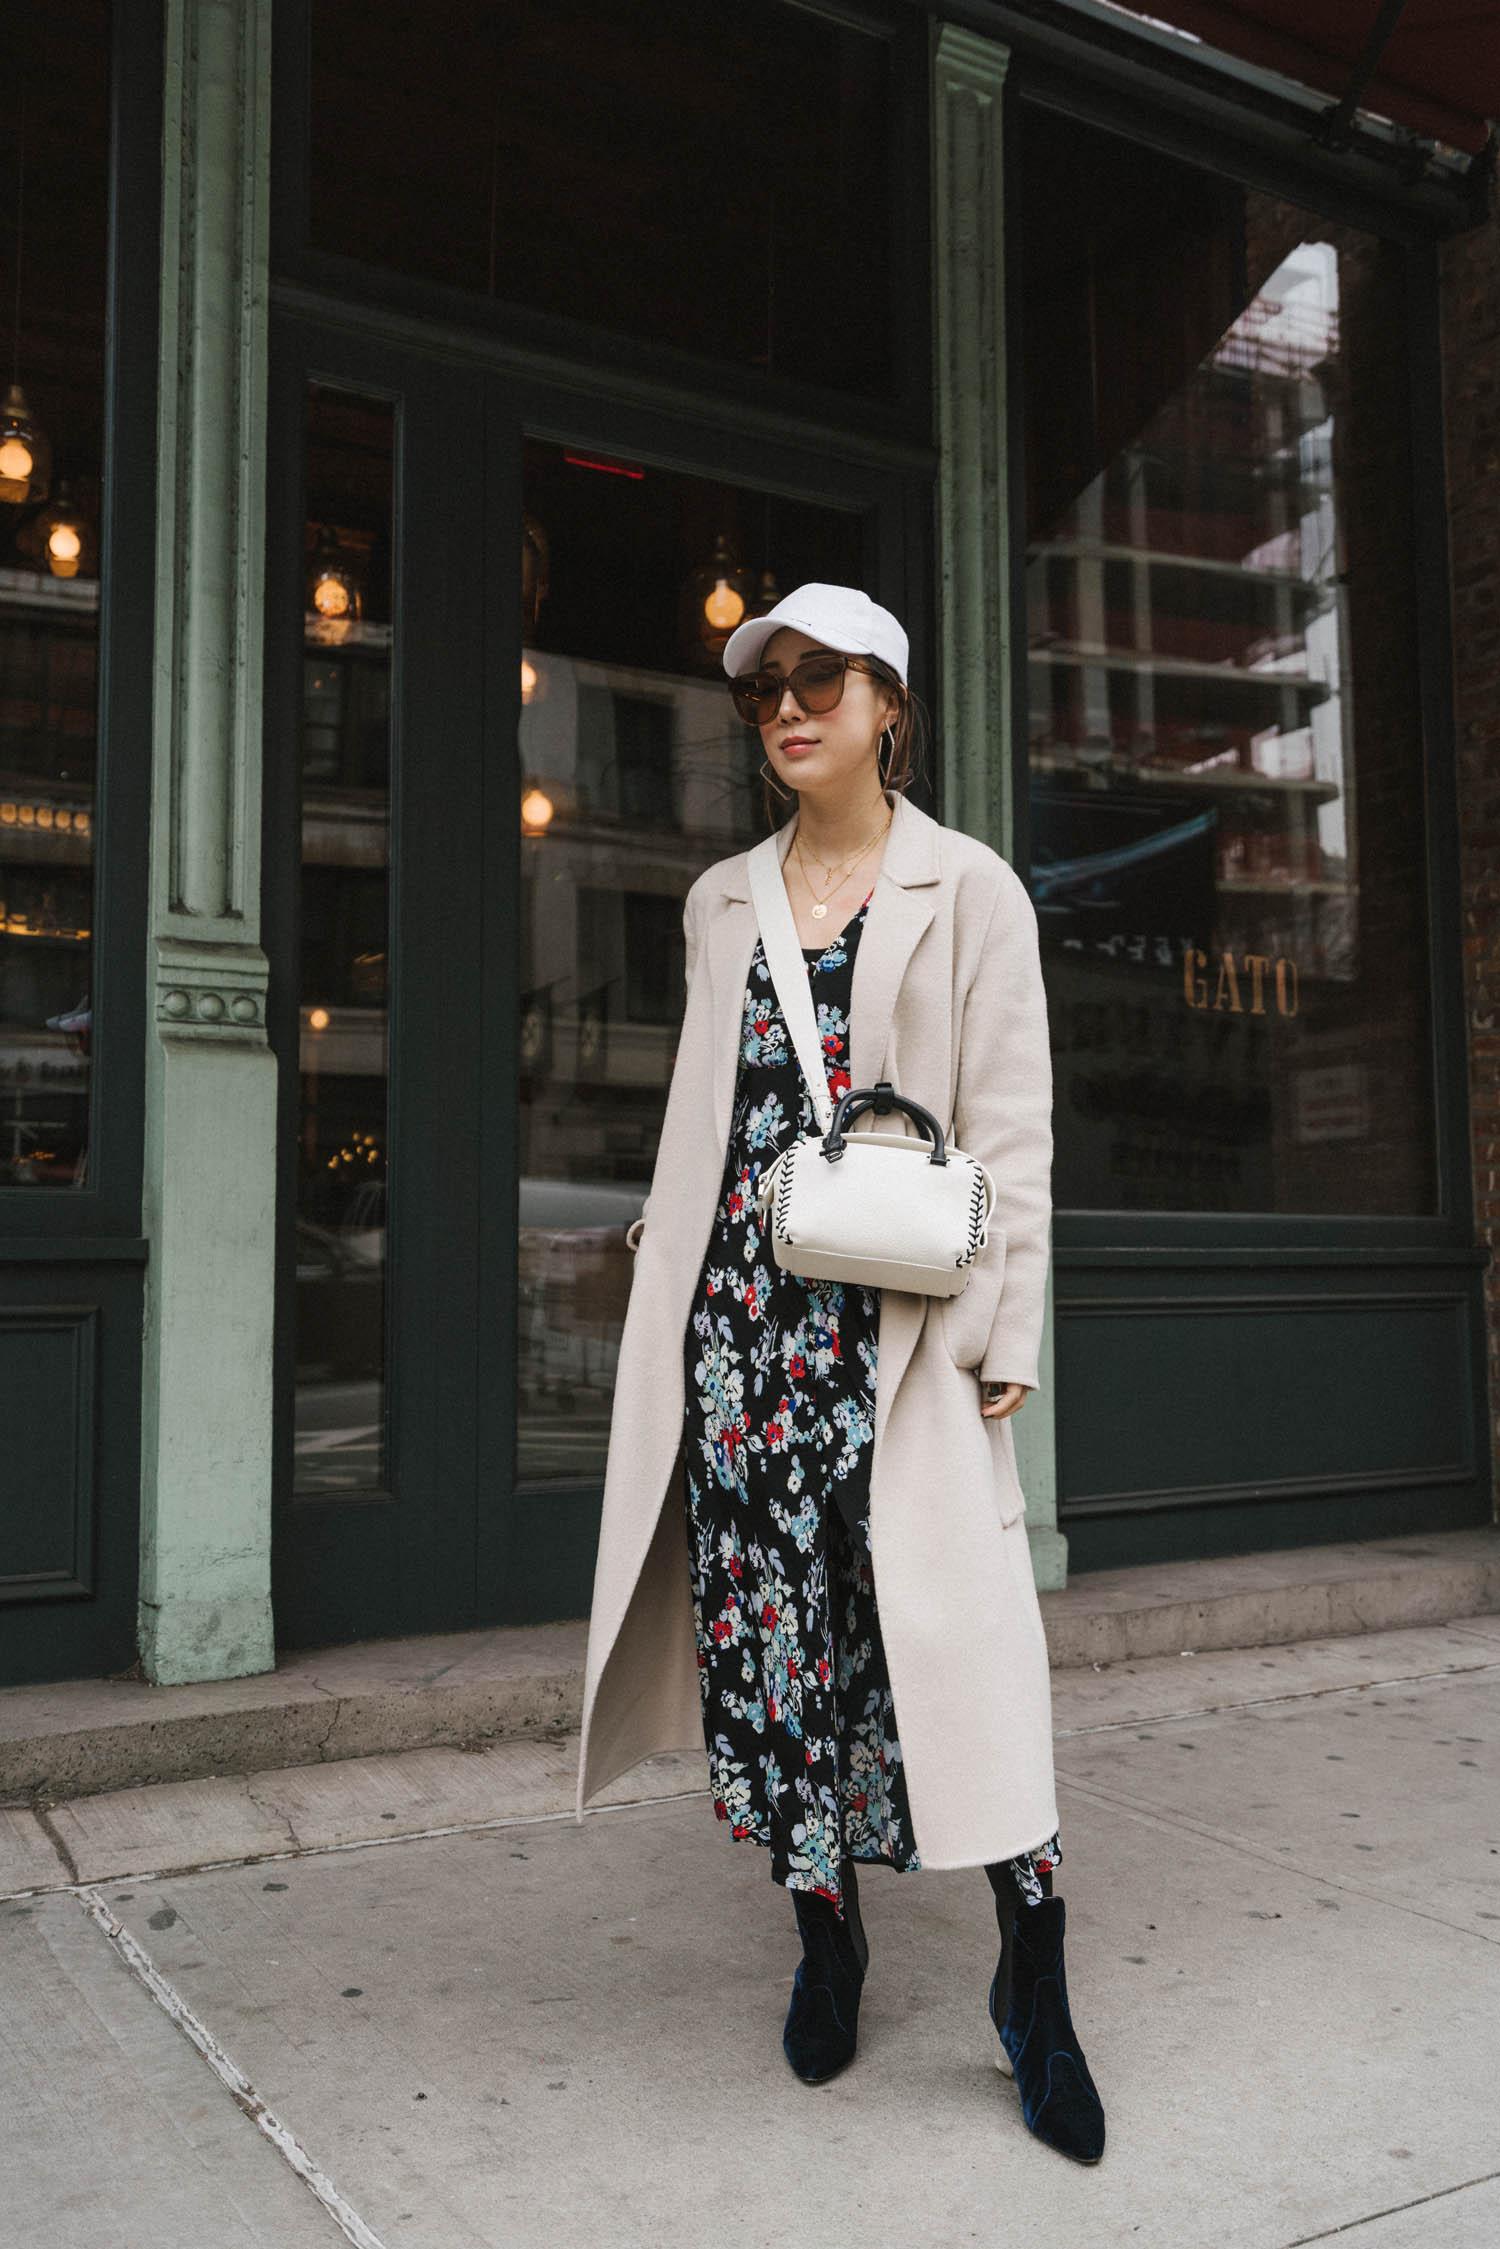 Sézane Coat, Rixo Dress,  Delvaux Bag , Alaïa Boots,  Balenciaga Hat , Gentle Monster Sunglasses,  Area Earrings